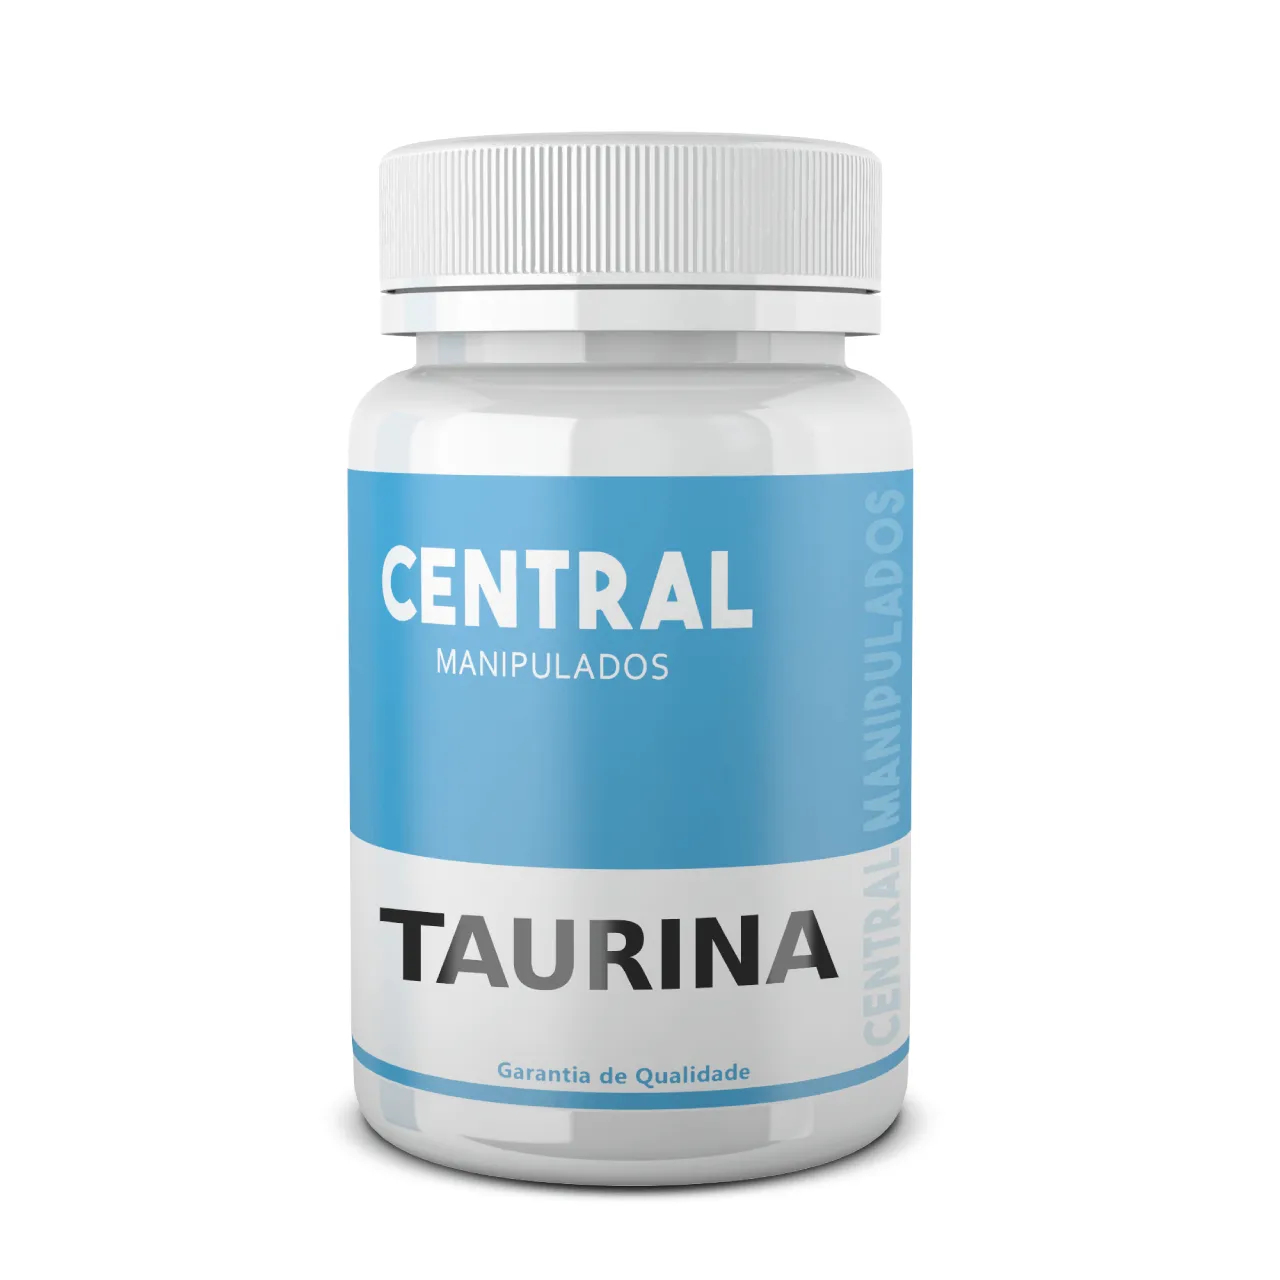 Taurina 500mg - 180 cápsulas - Energia, humor saudável, antioxidante, Protetor Cardiovascular